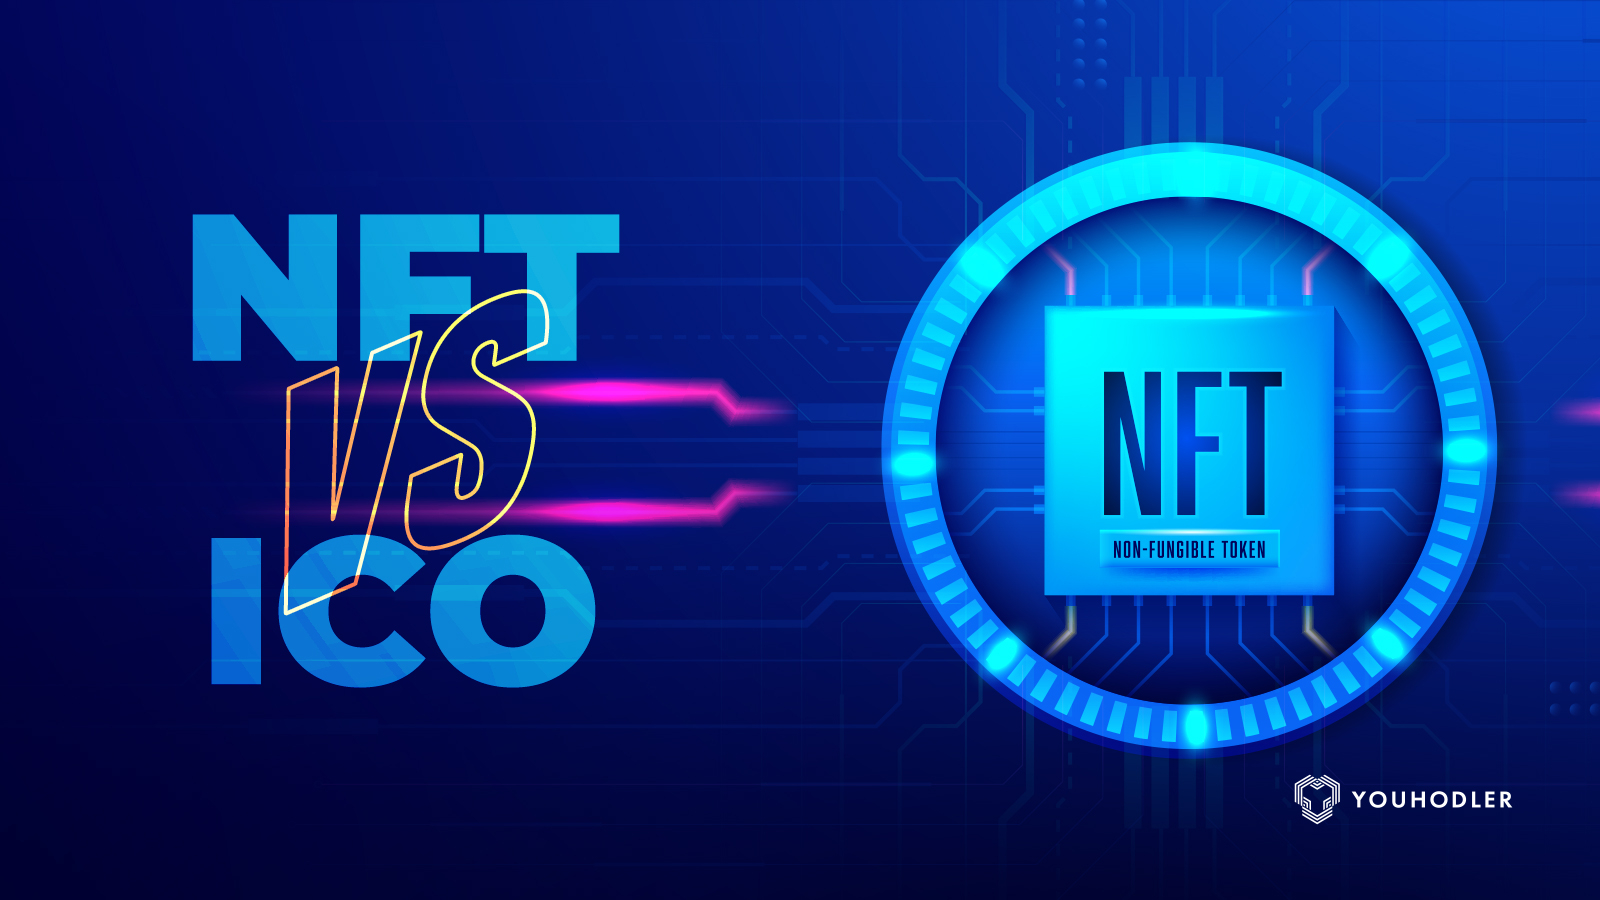 NFT vs ICO logo